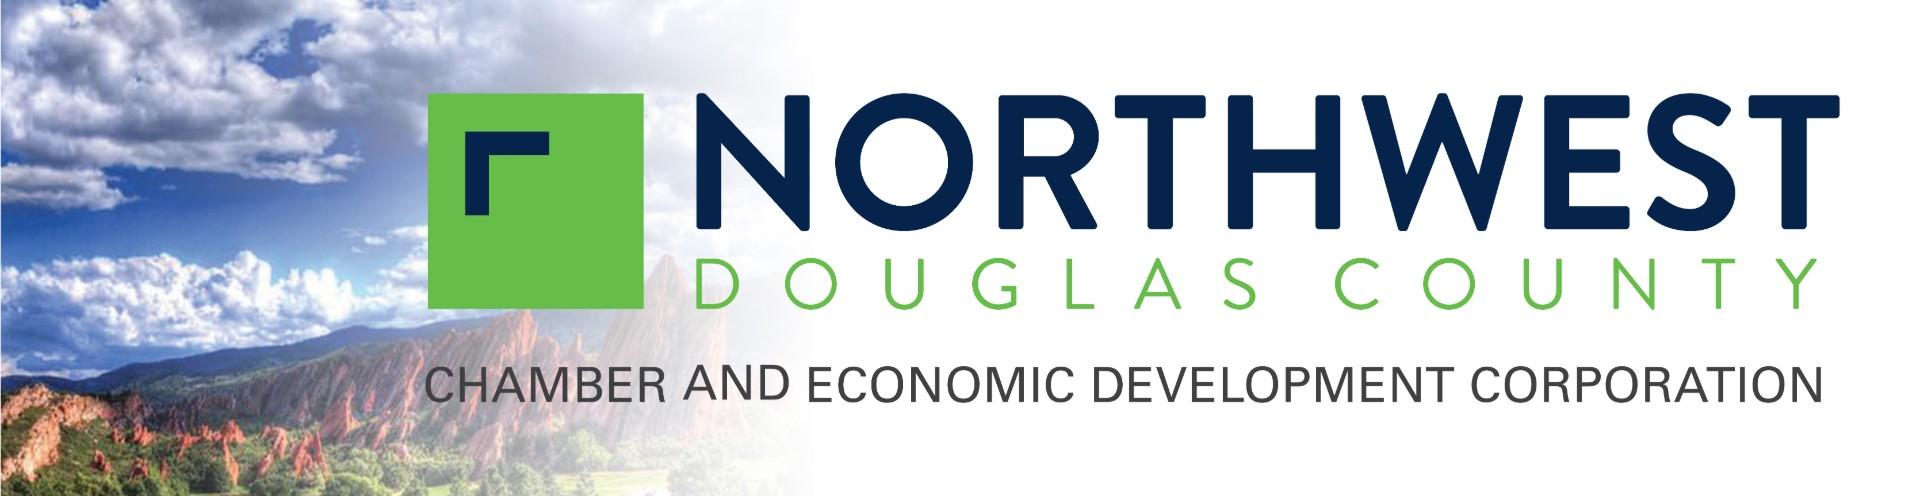 nw-douglas-county-banner